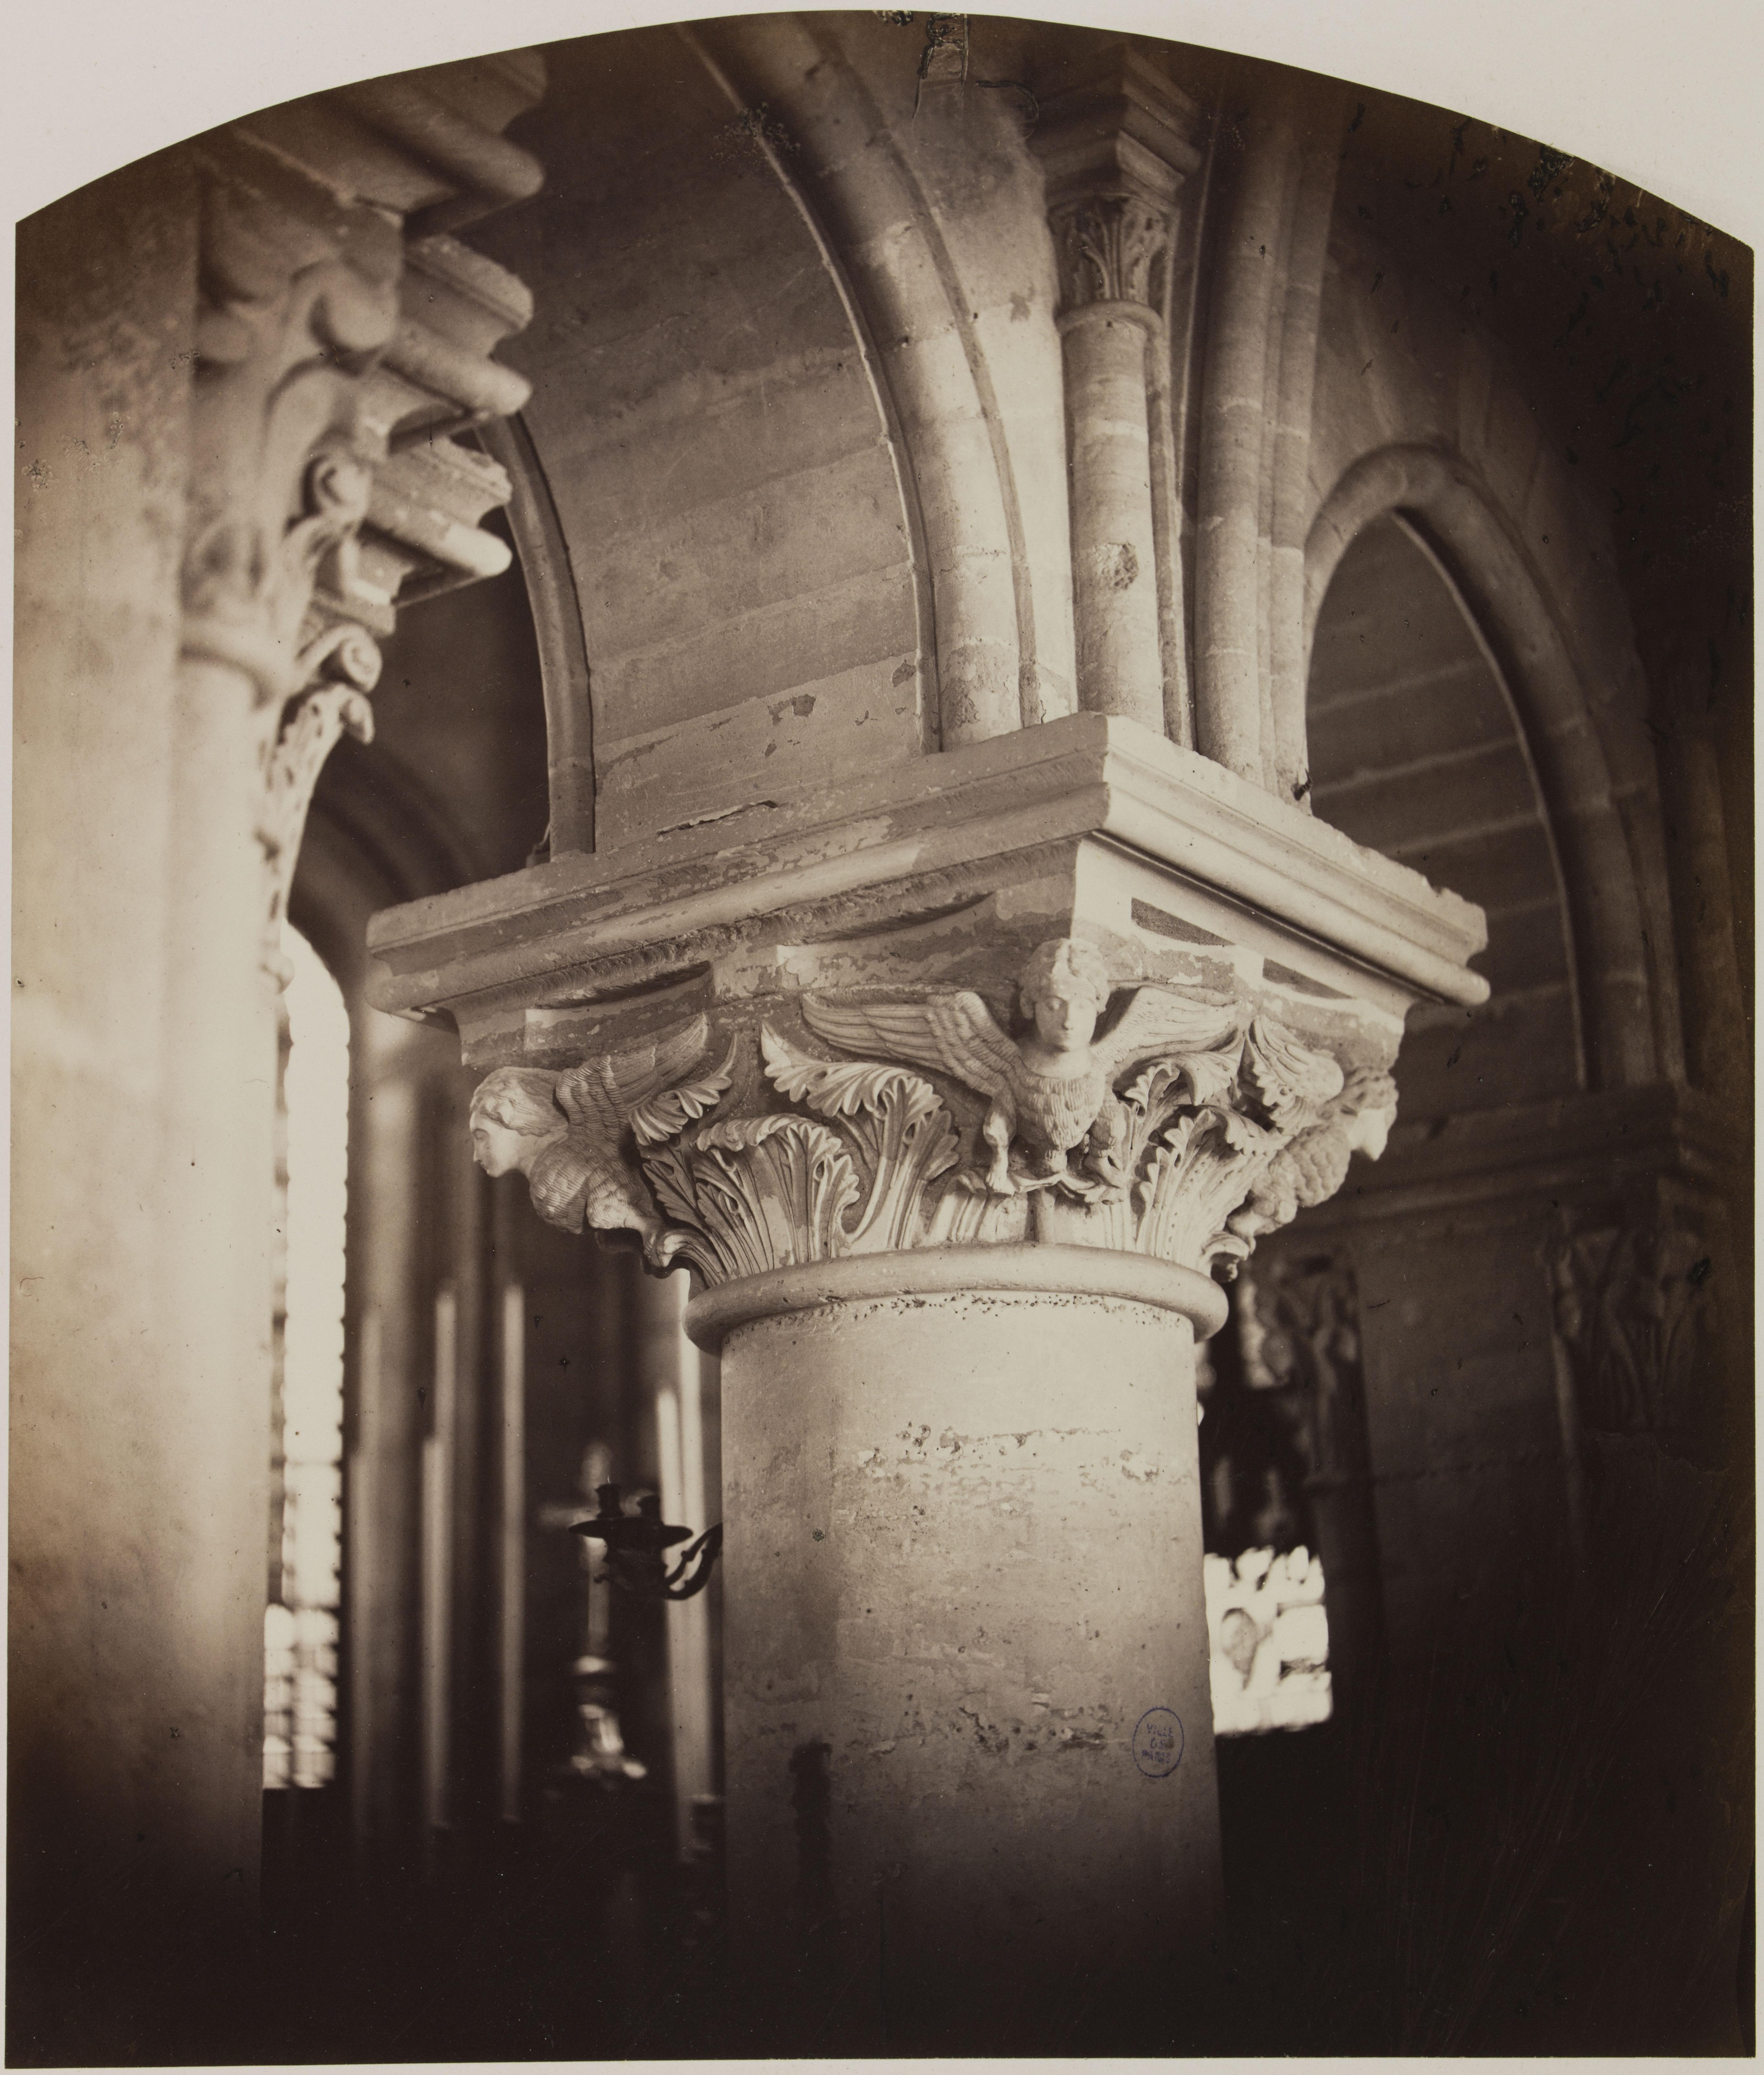 Церковь Сен-Жюльен-ле-Повр. Капитель у входа